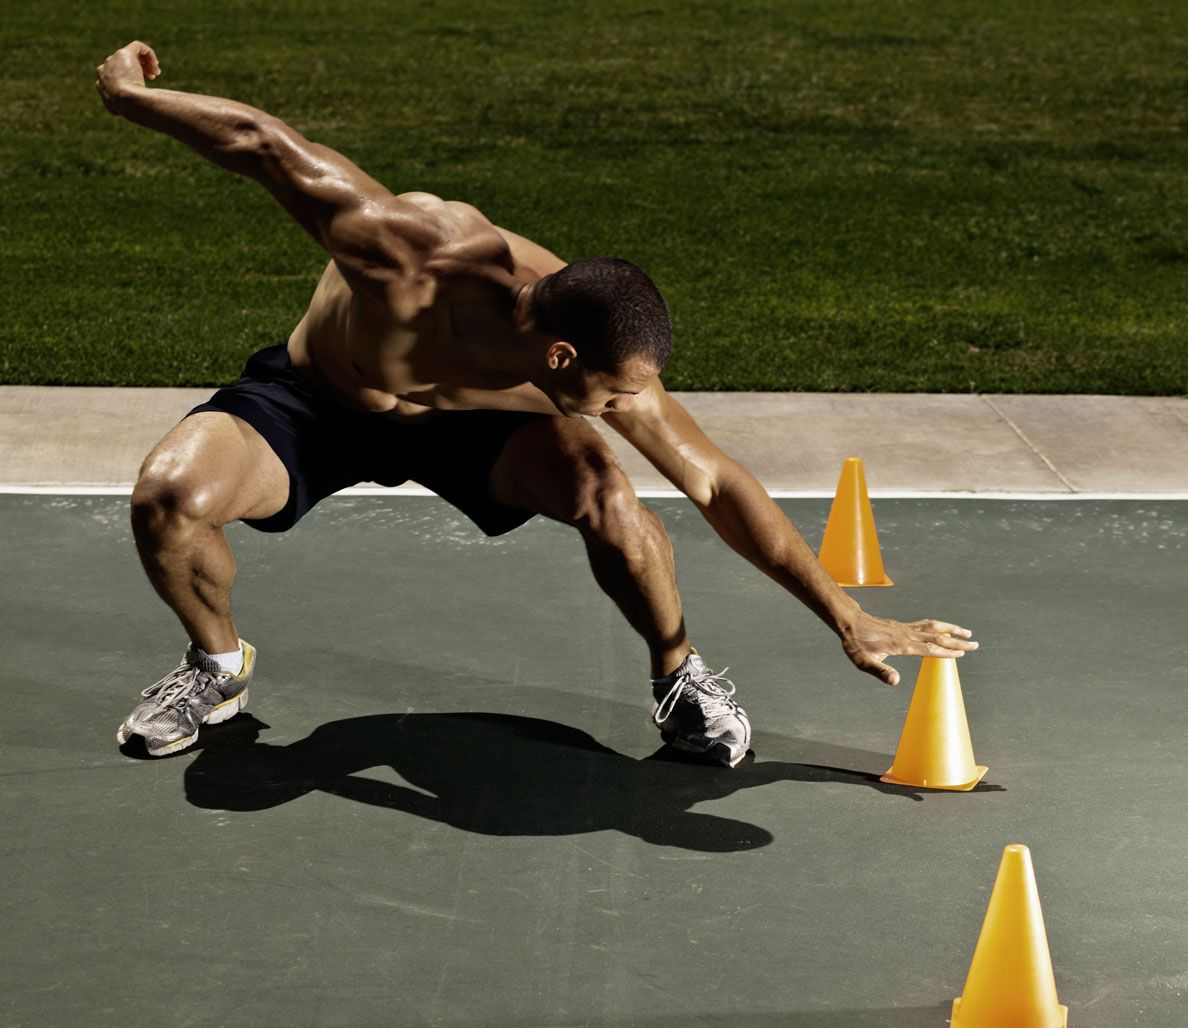 Pintrest Workouts Fitness: Best 25+ Mens Fitness Ideas On Pinterest